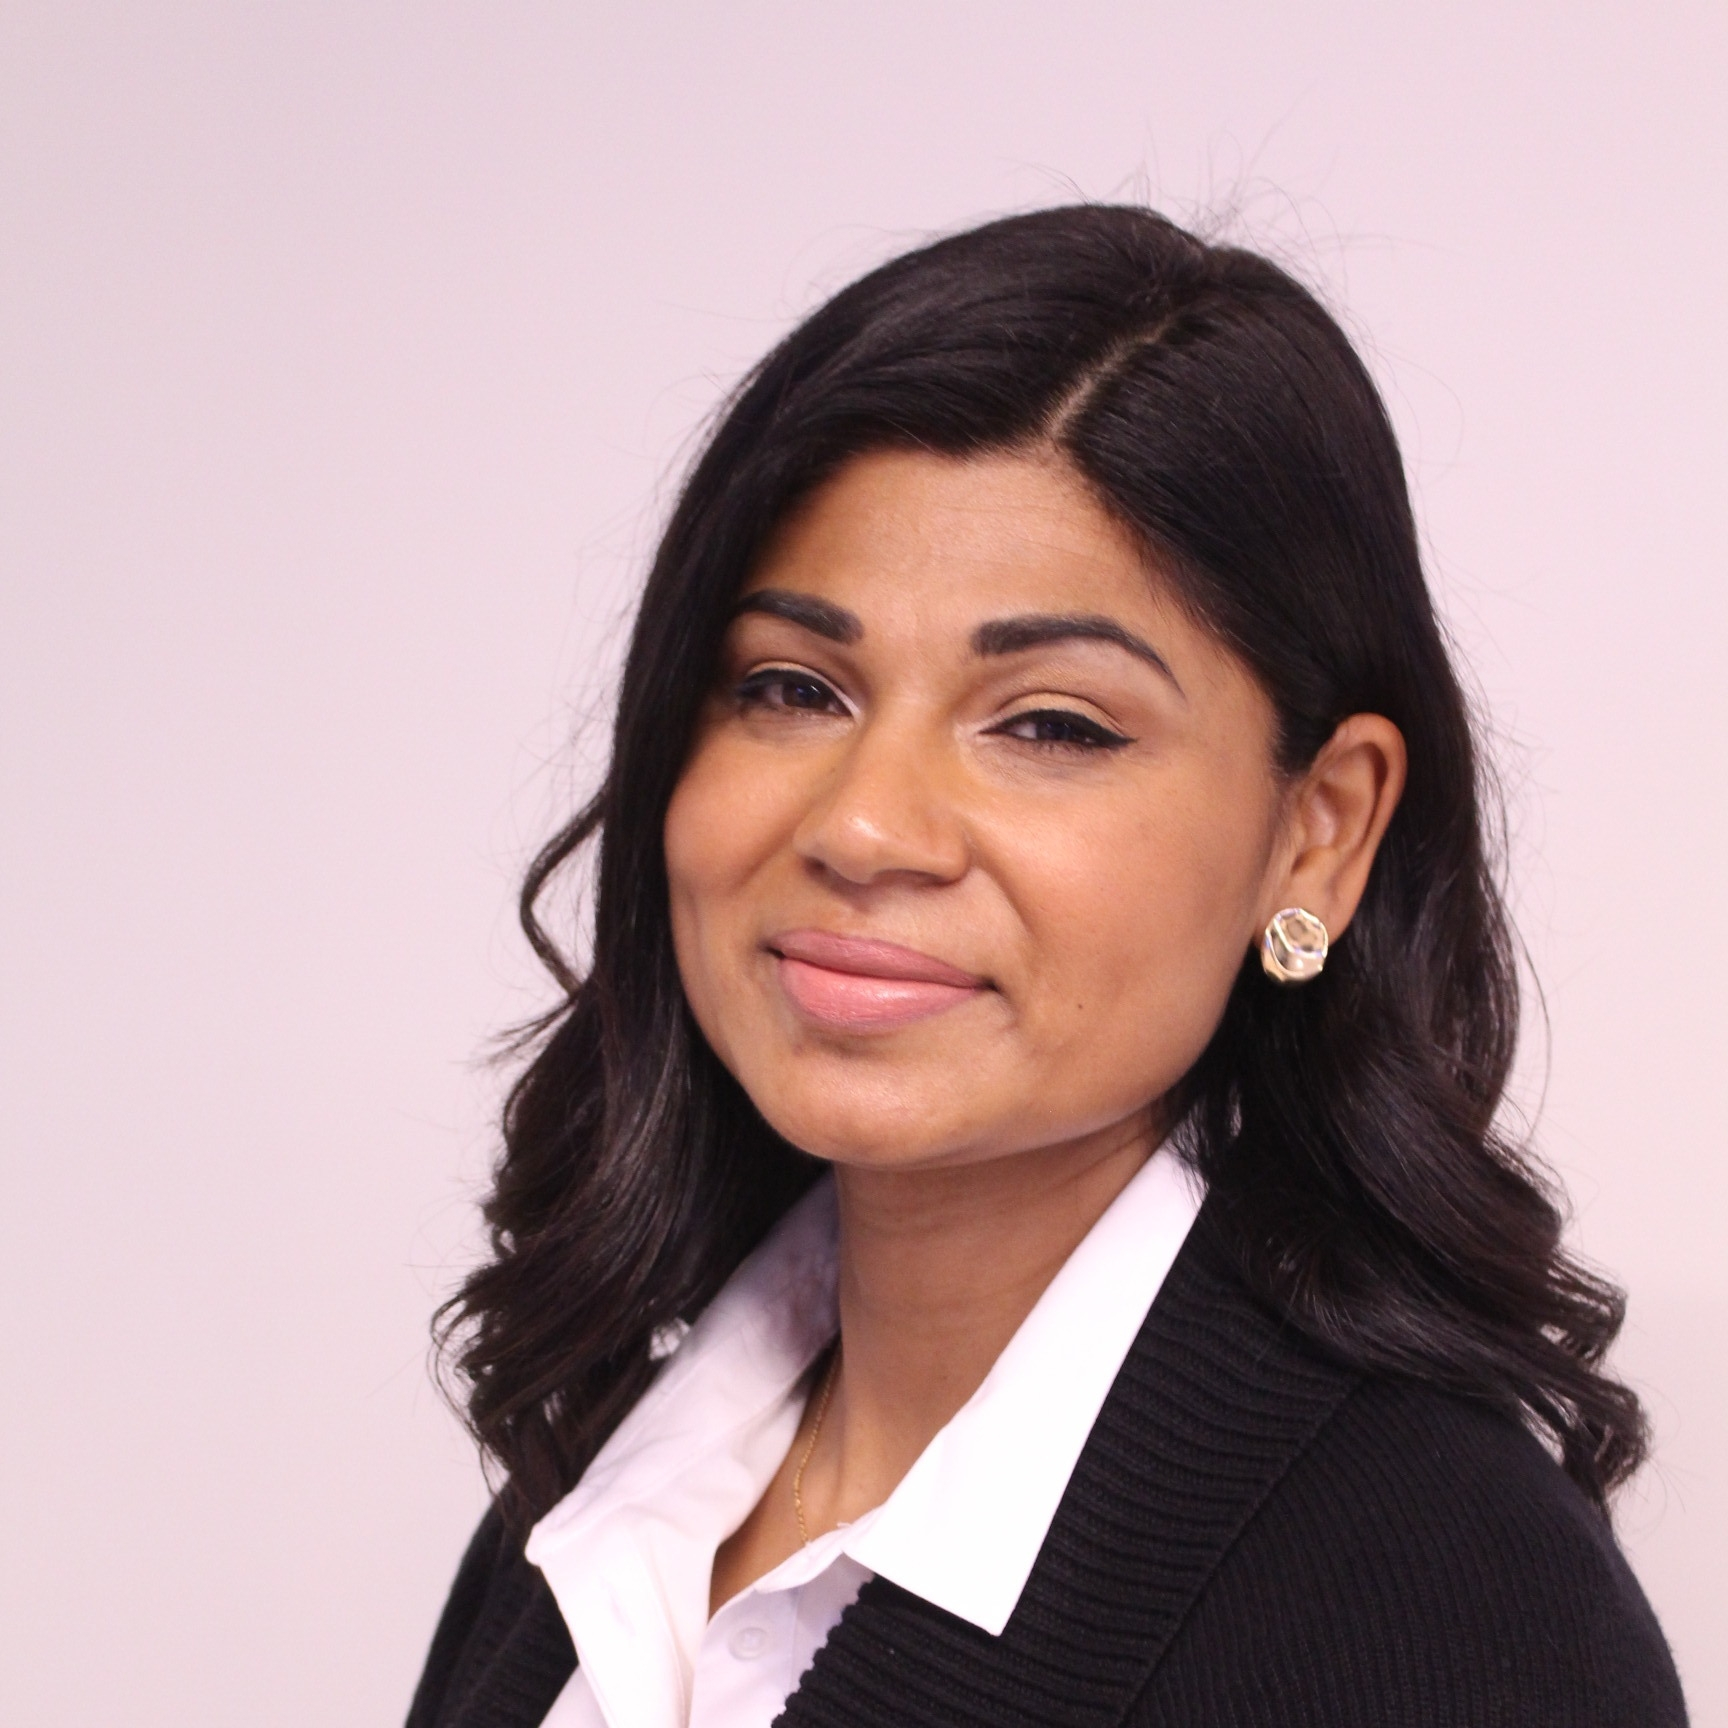 Saima Malik - Assistant Vice President, Portfolio Planning and Prioritization, Digital at TD Bank Group